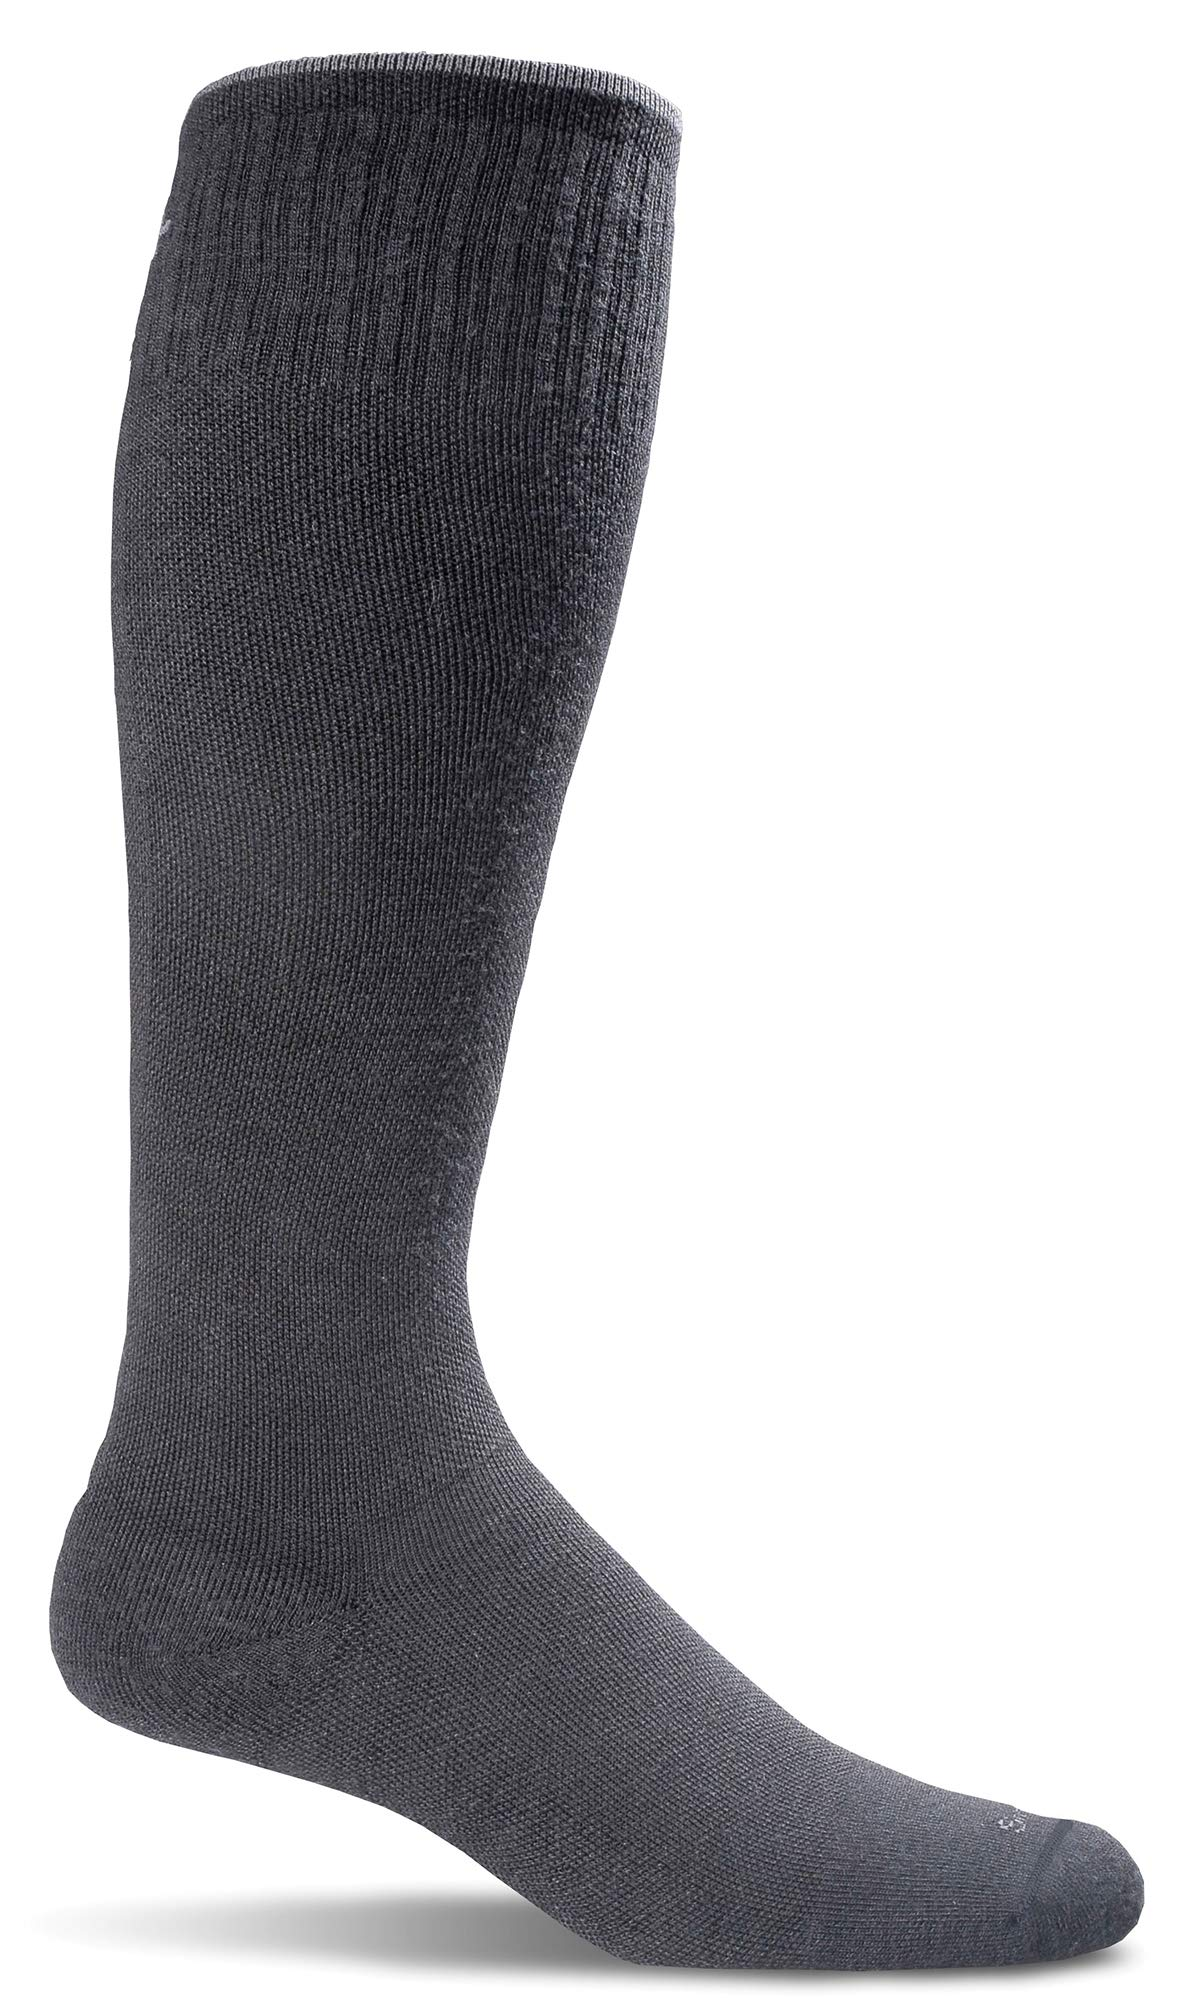 Sockwell Women's Circulator Moderate Graduated Compression Socks